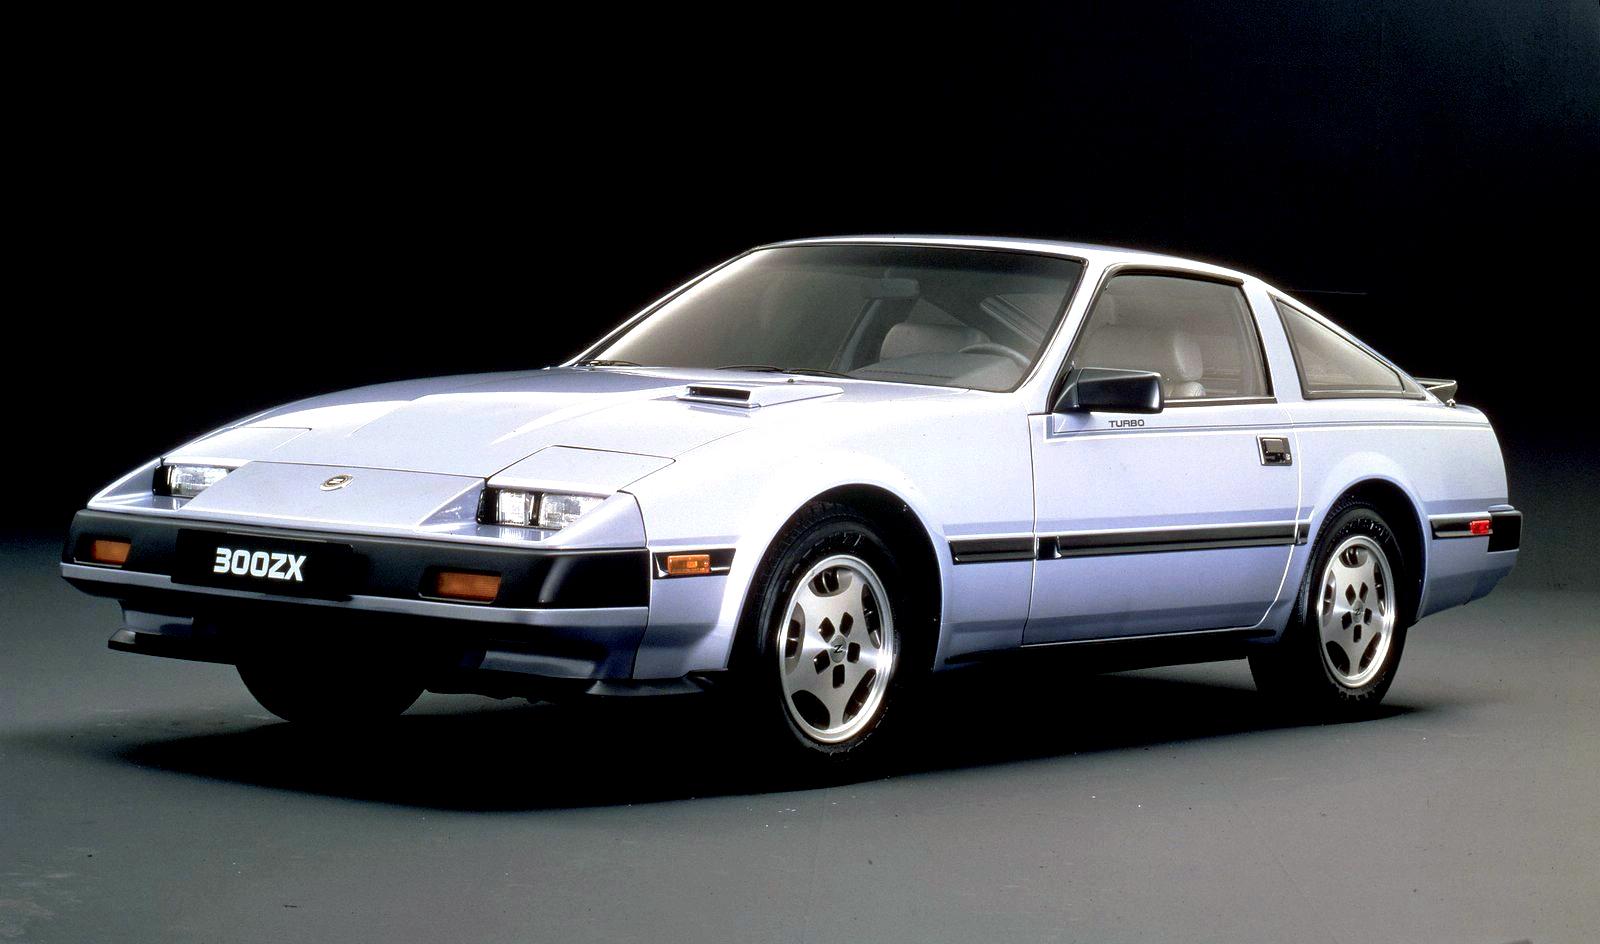 Nissan 300ZX I (Z31) 1983 - 1989 Coupe #4